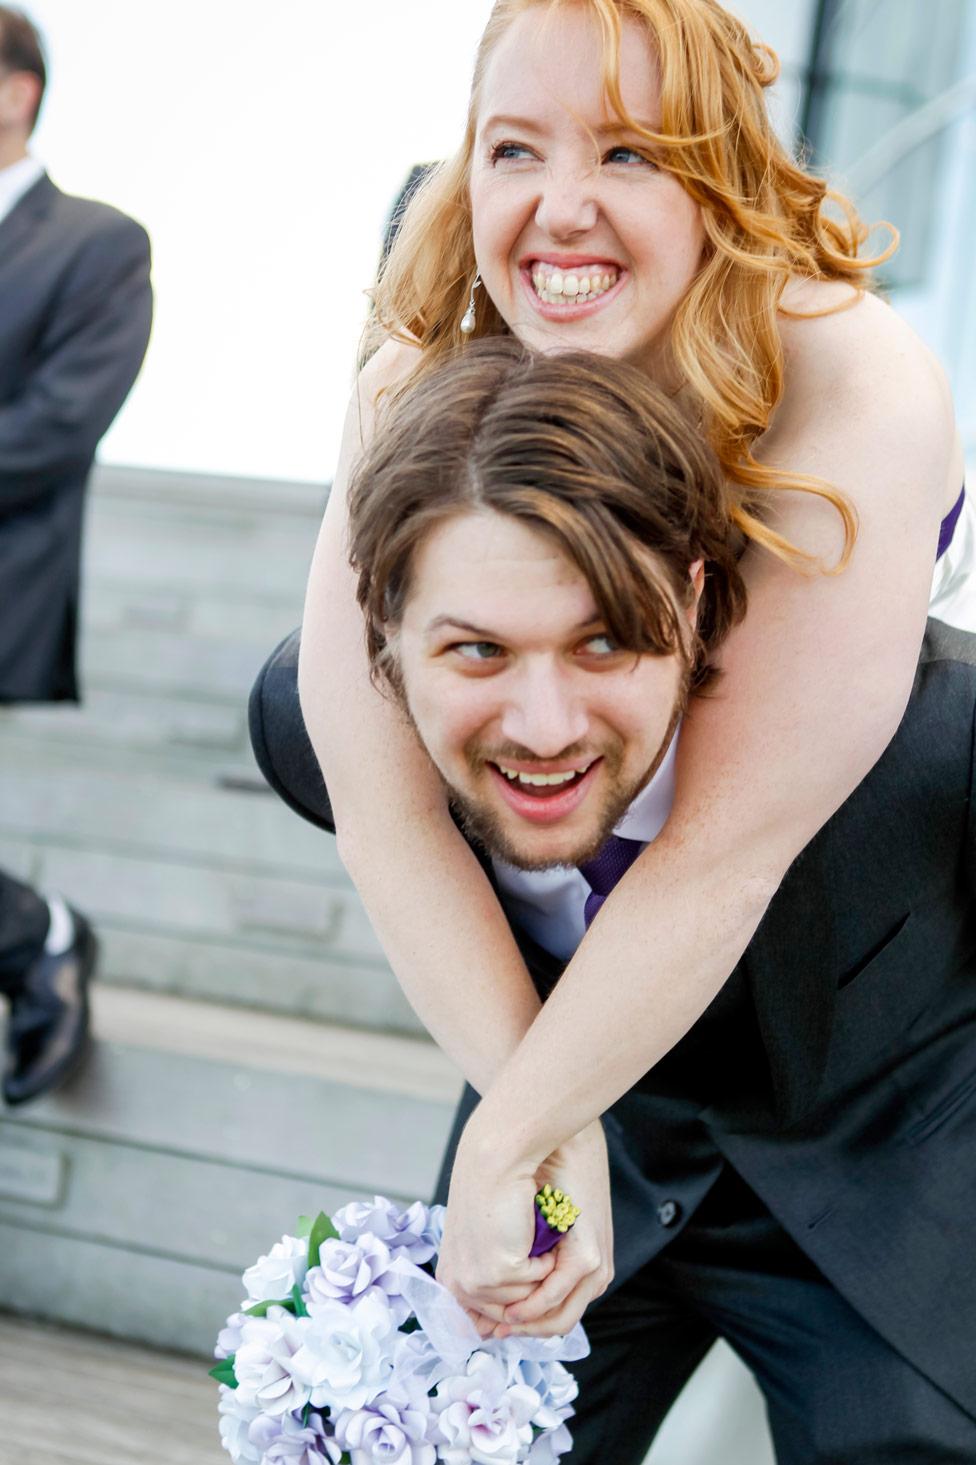 milwaukee-discovery-world-pier-wisconsin-wedding-ruthie-hauge-photography-19.jpg